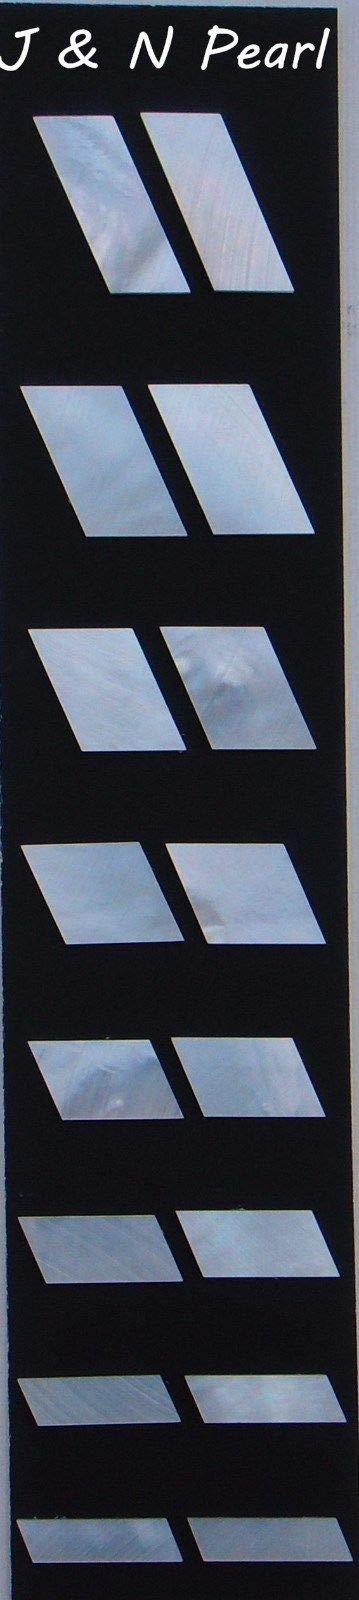 FidgetFidget Parallelogram Inlay Set Mother of Pearl per set for Acoustic Guitars 16pcs